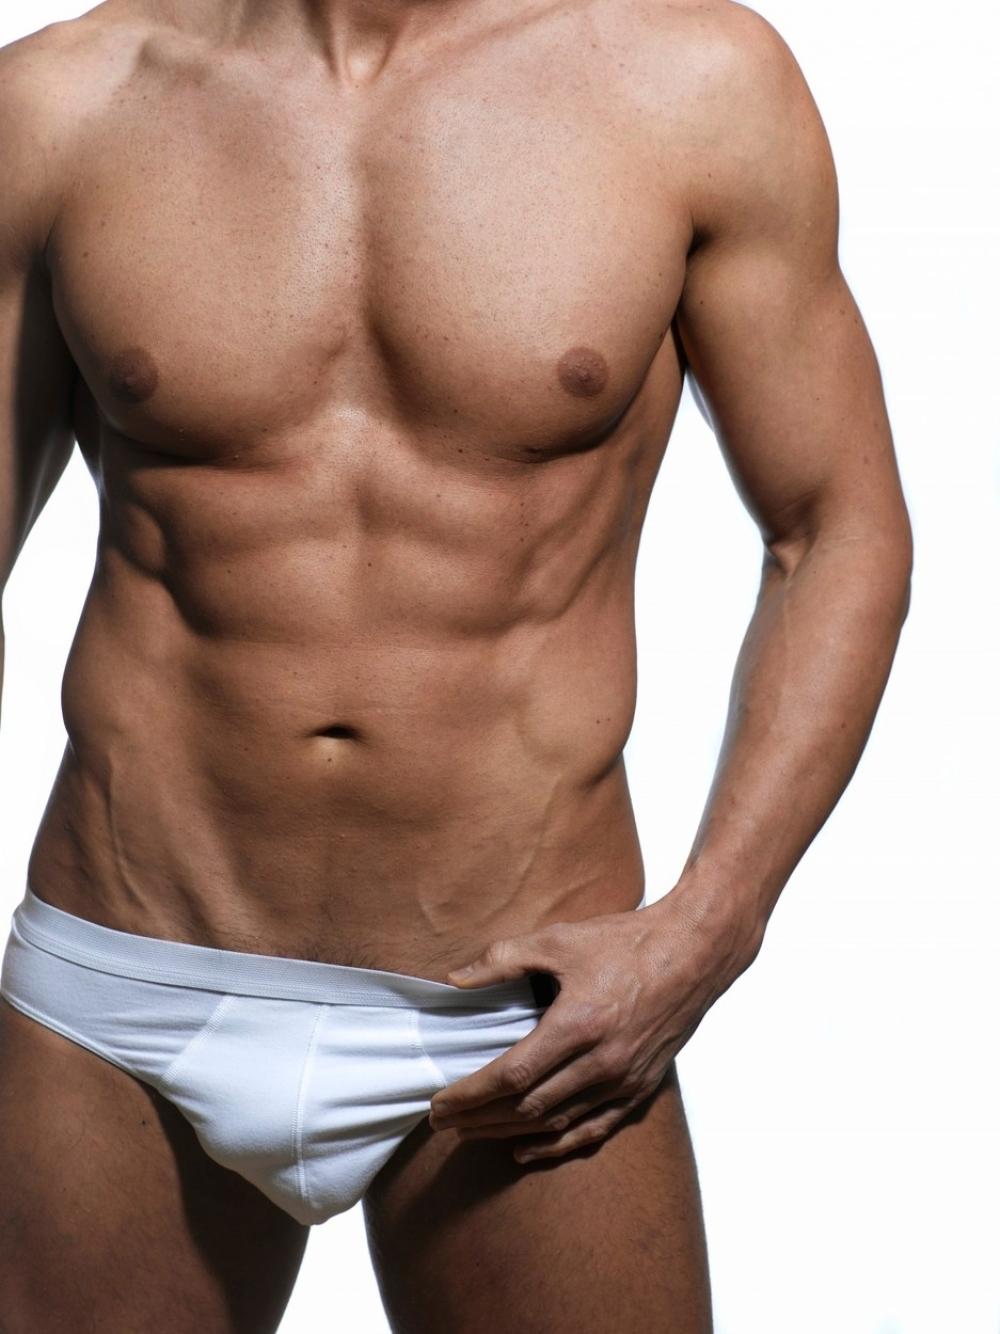 strip - Strip-tease